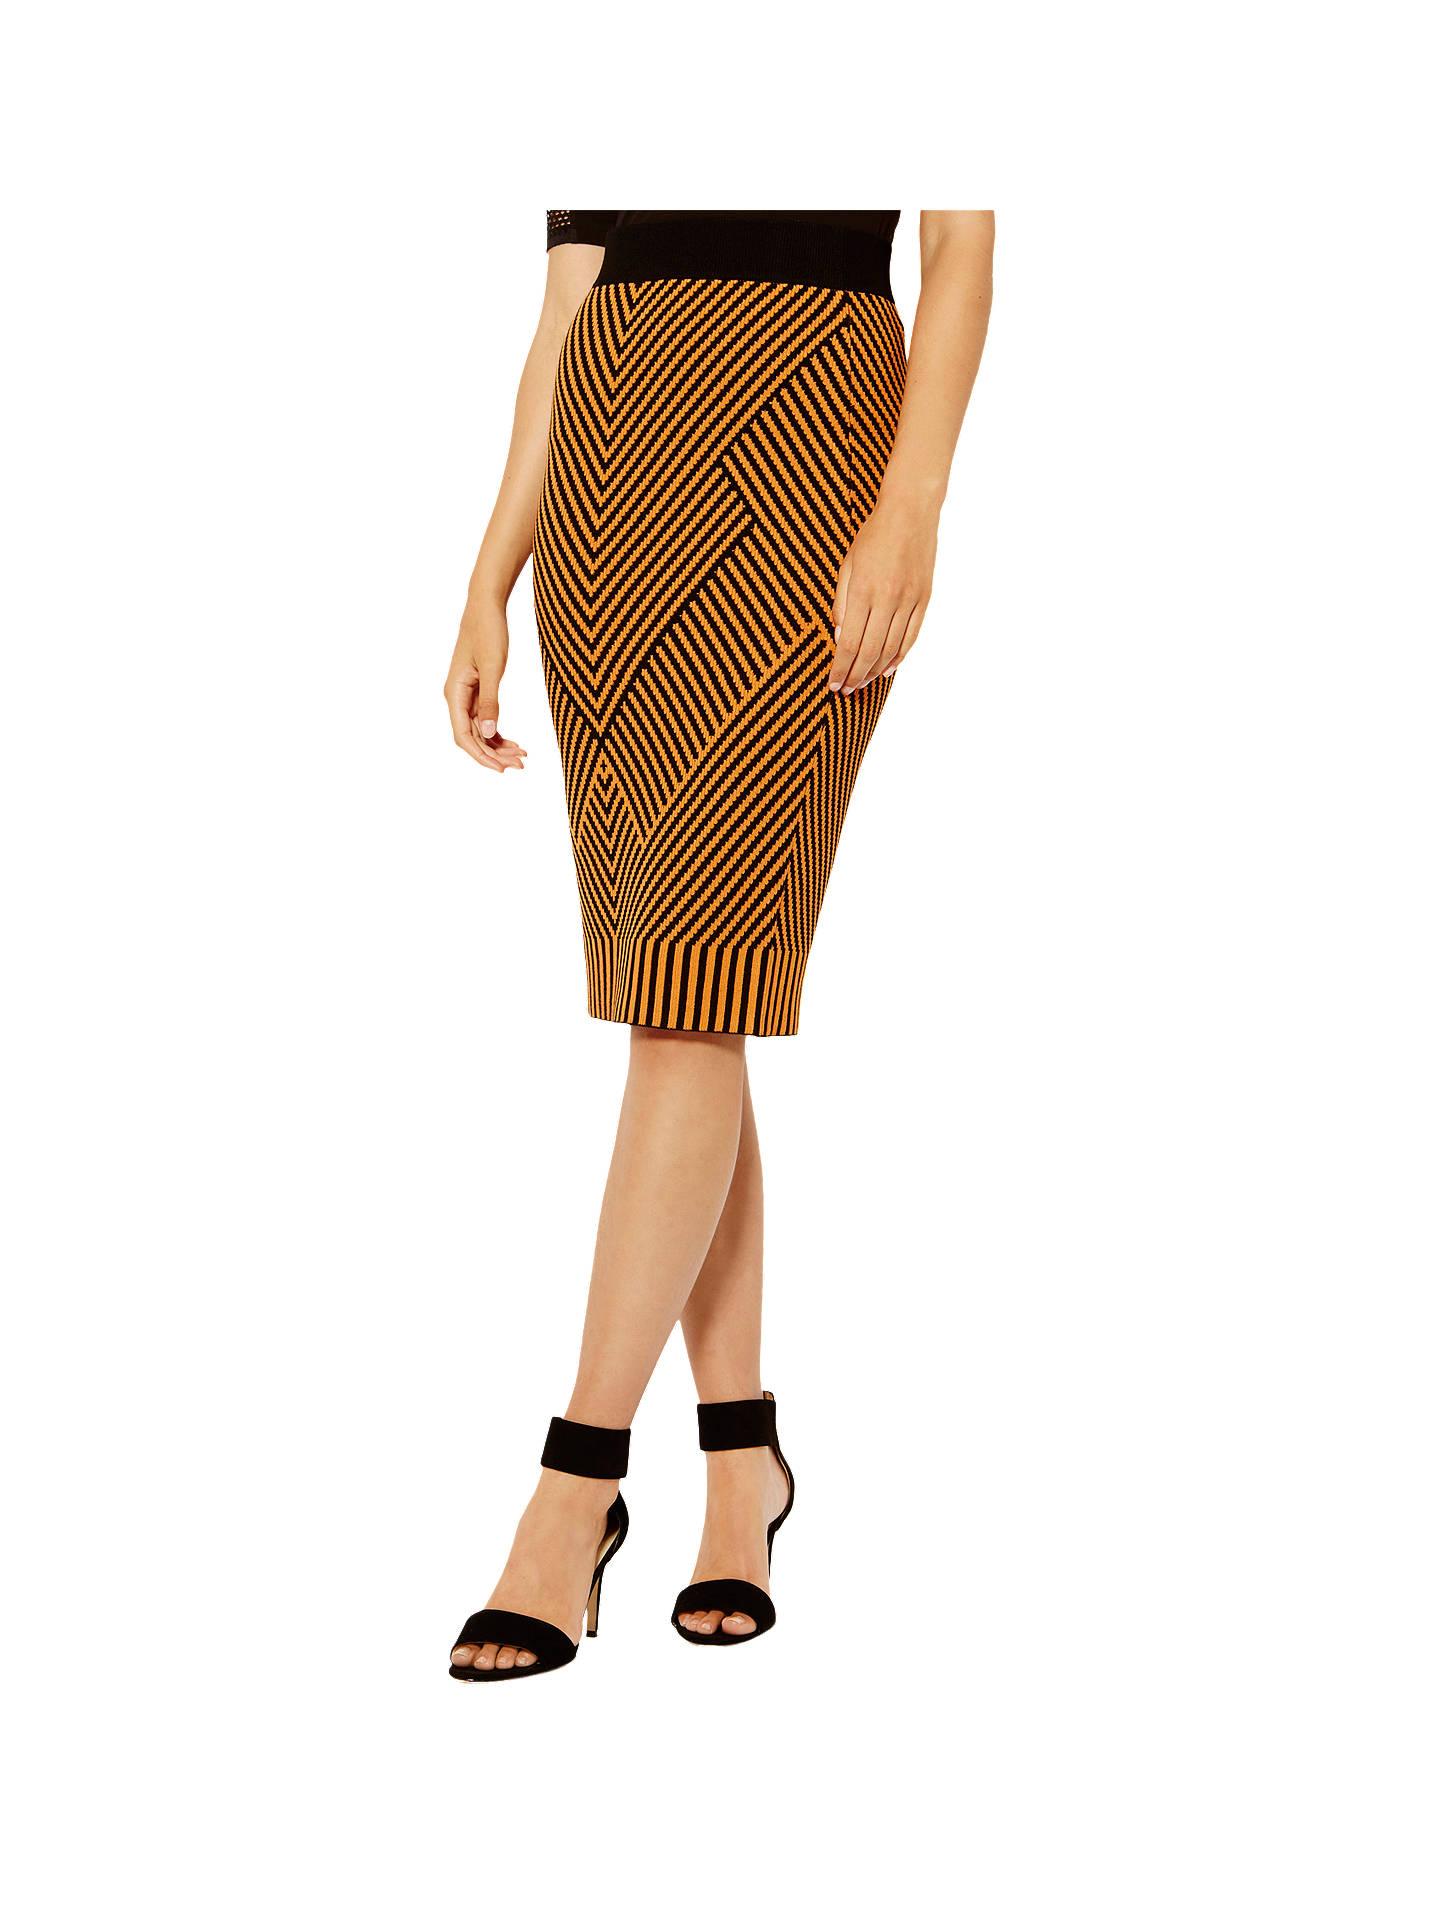 df9403a20f Buy Karen Millen Contrast Knitted Pencil Skirt, Orange/Multi, XS Online at  johnlewis ...